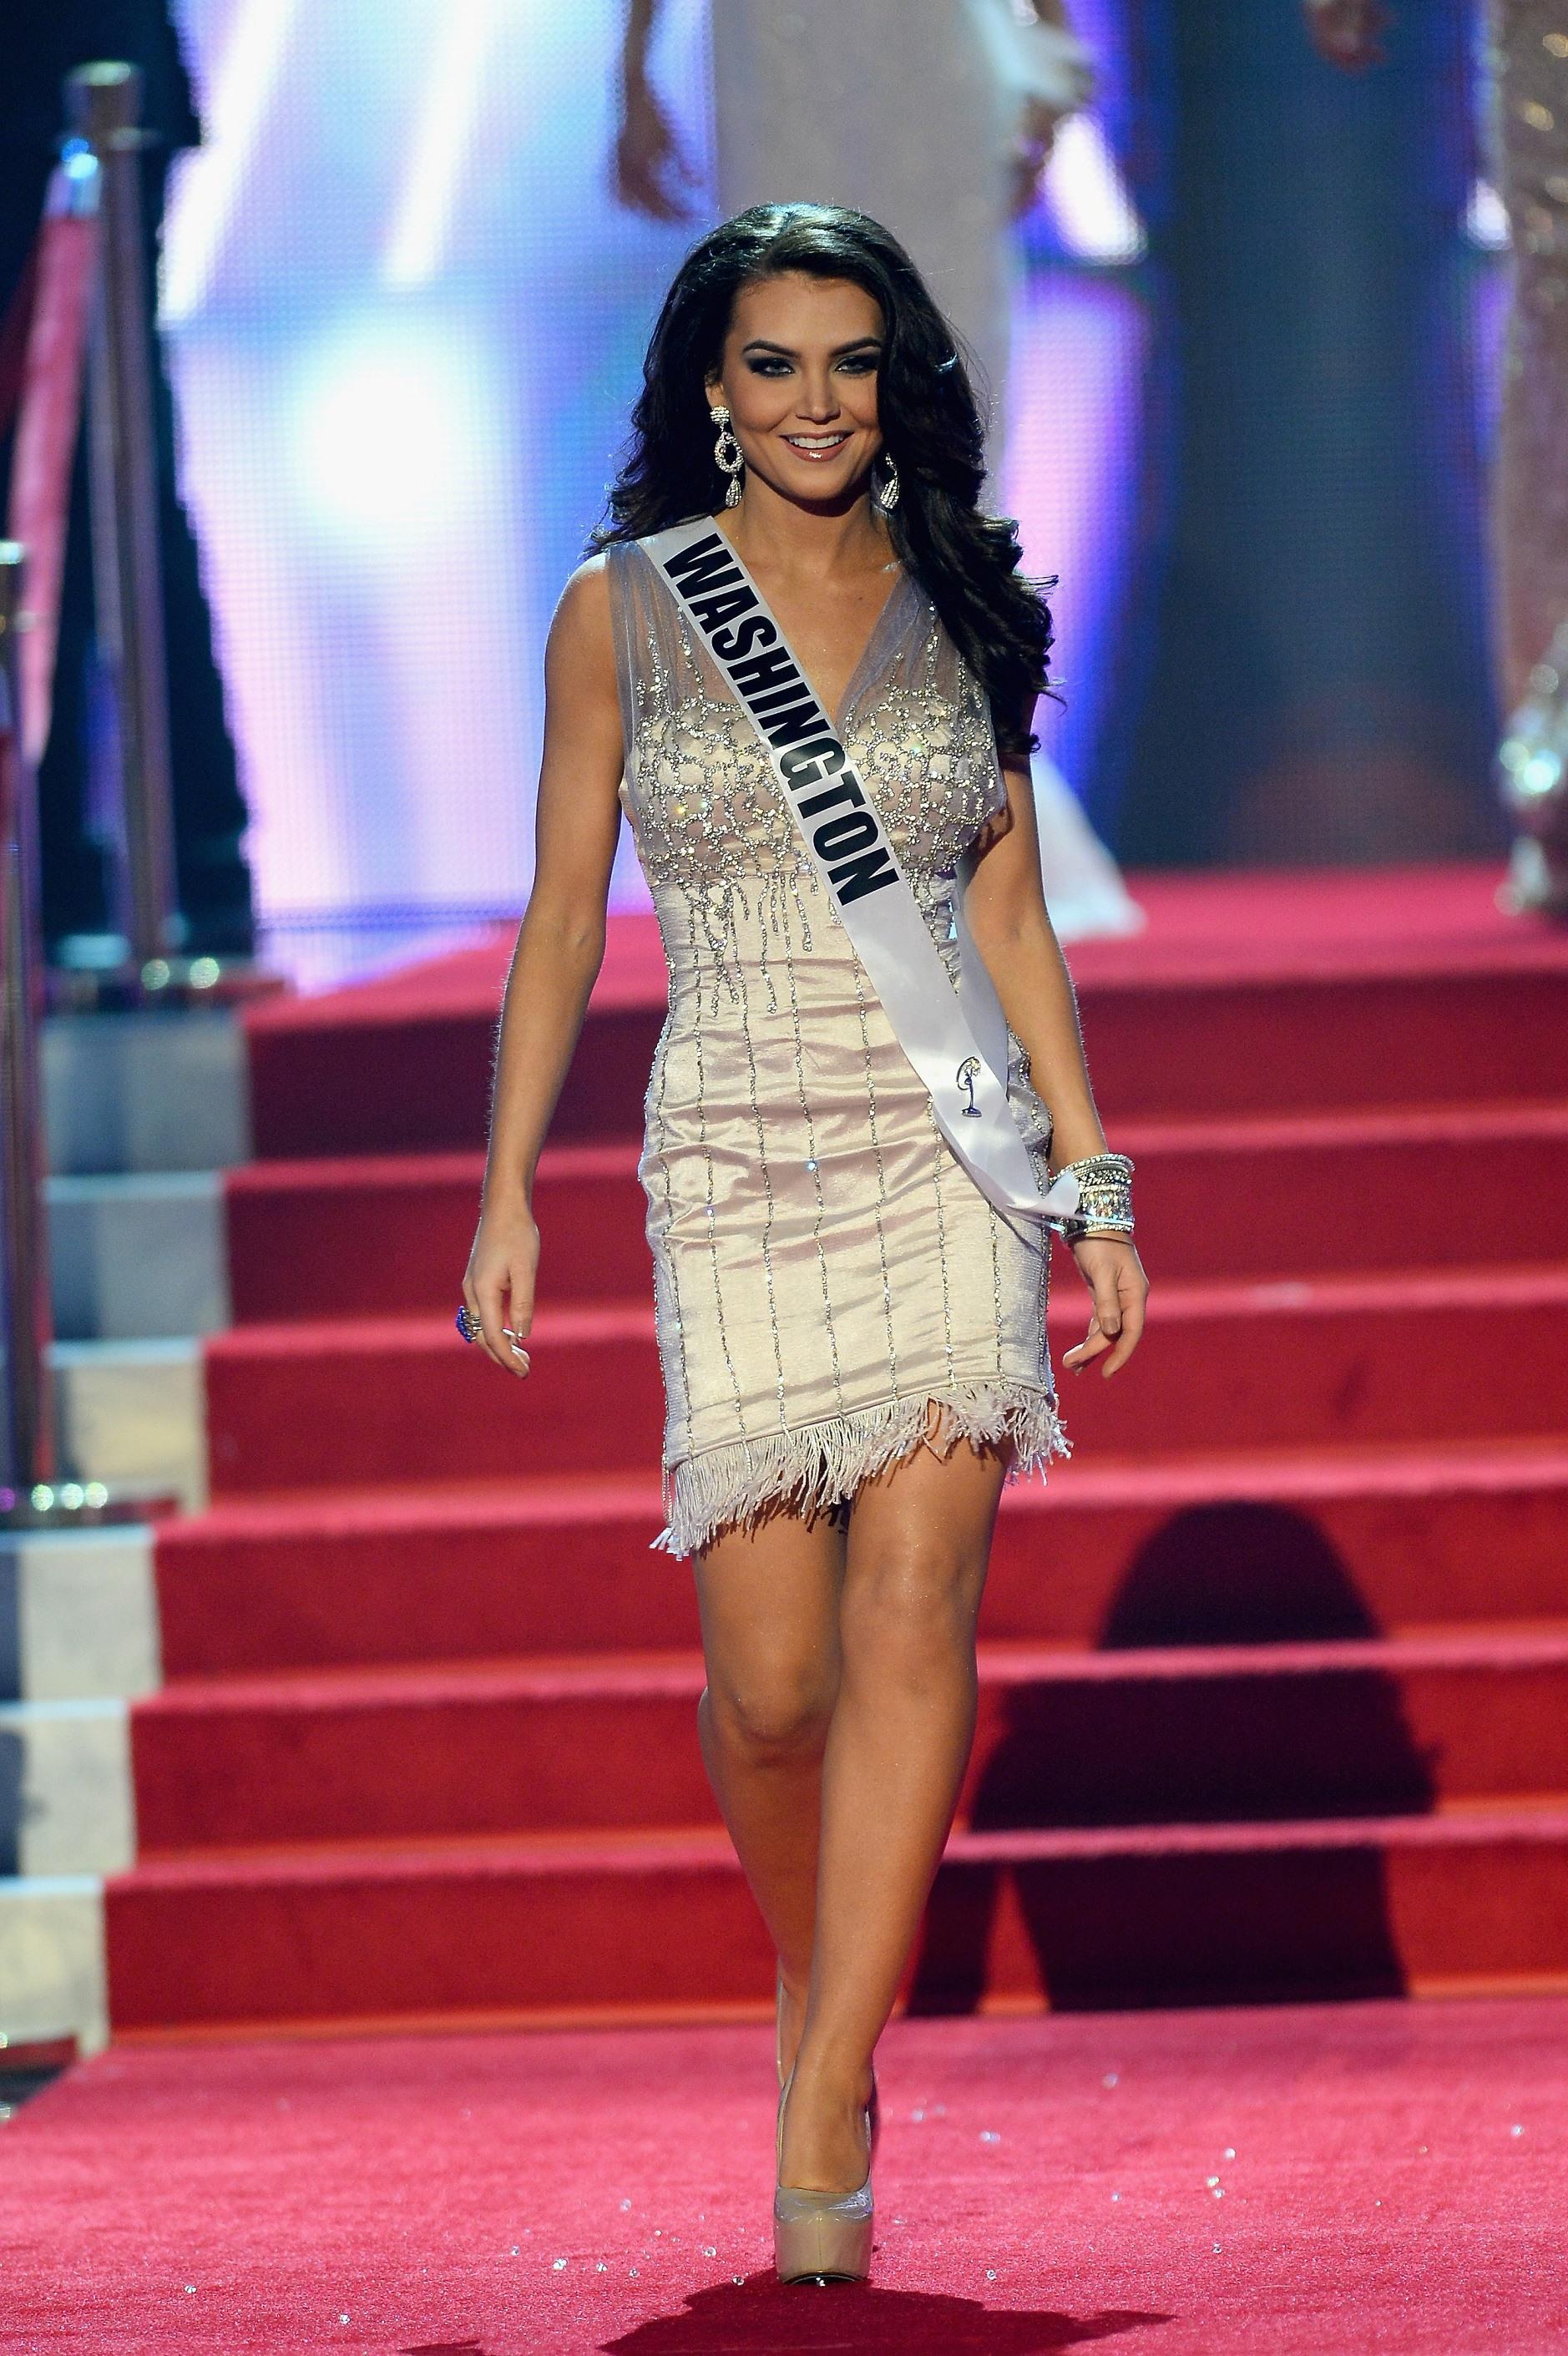 2013 Miss USA Miss Washington